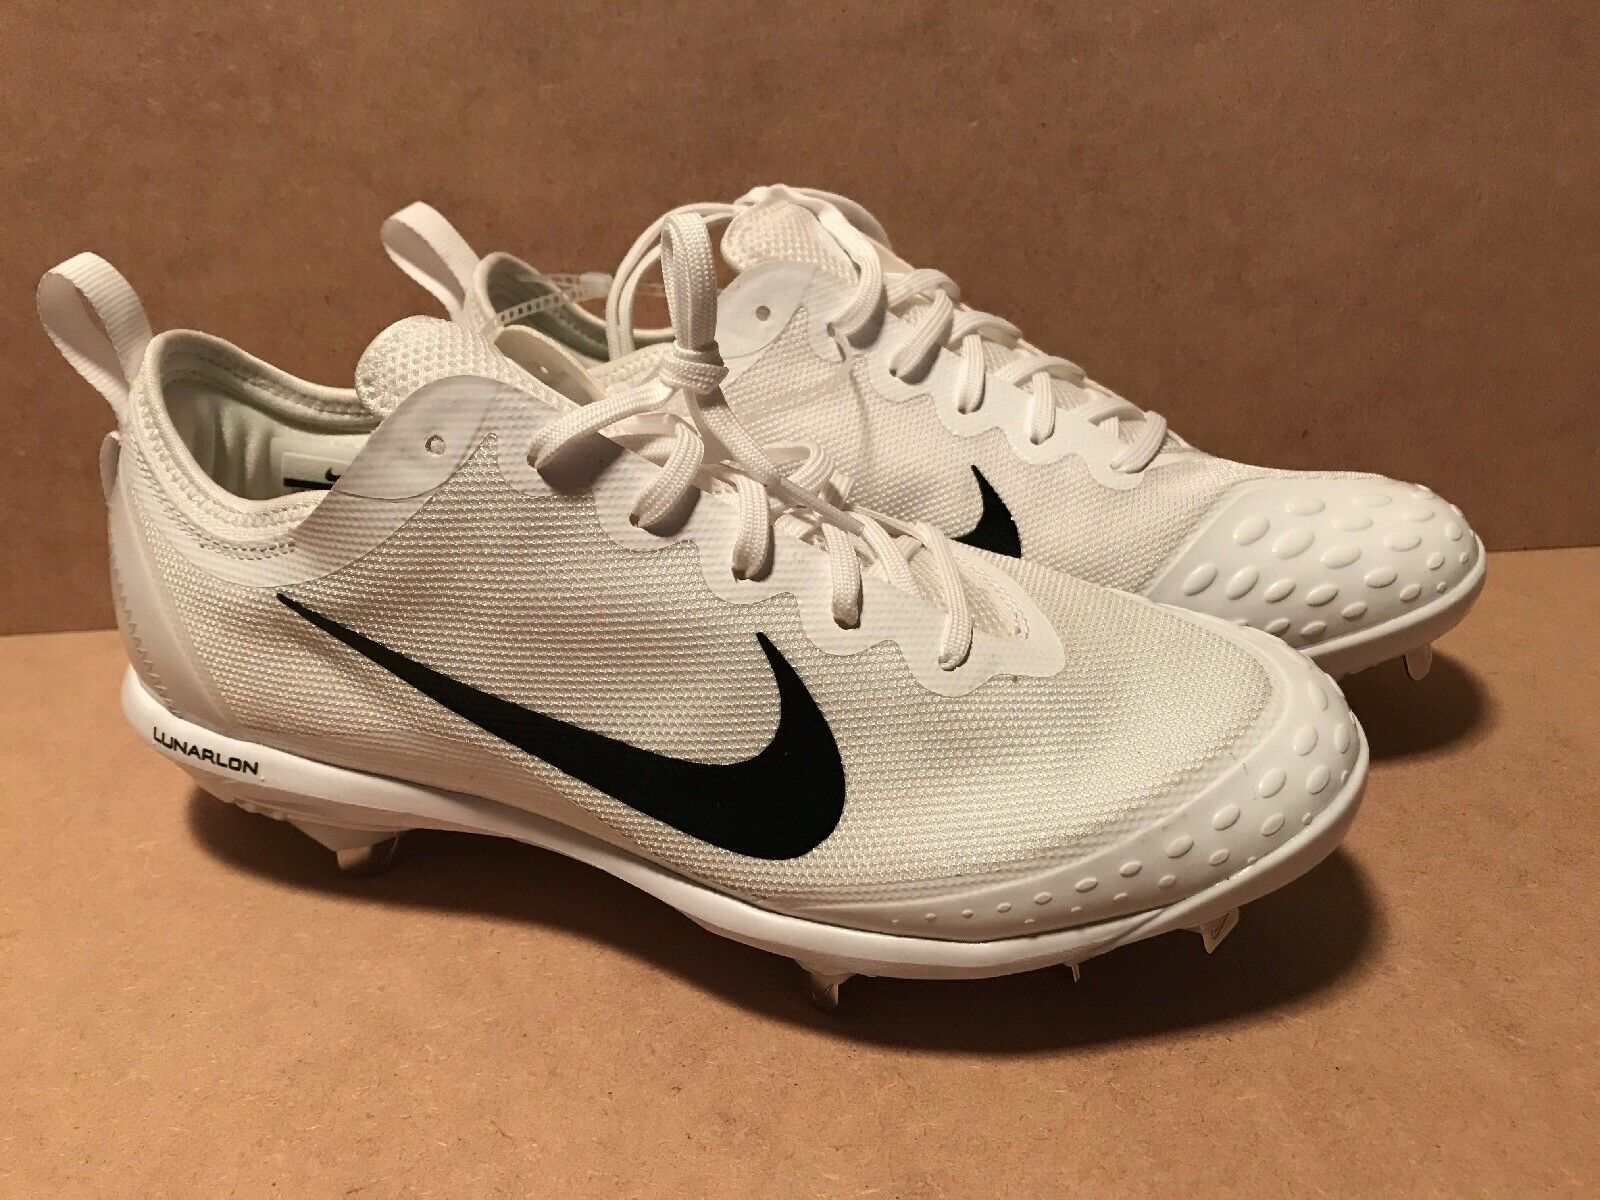 39c748872815 Nike 856433-101 Lunar Hyperdiamond 2 Elite Softball Softball Softball  Cleats Women s Size 11 New